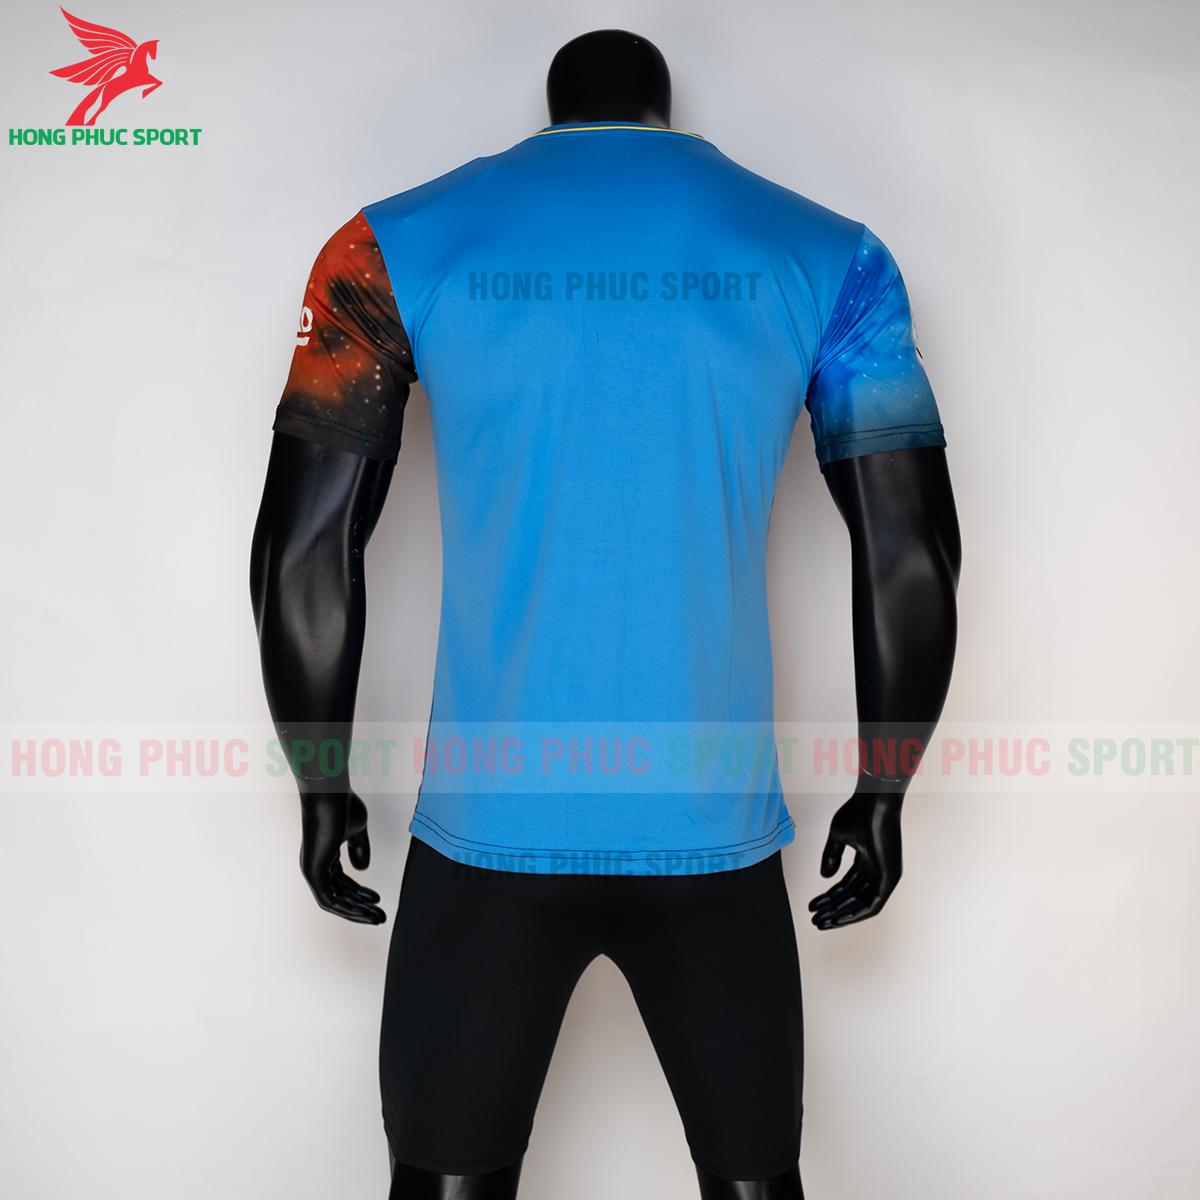 https://cdn.hongphucsport.com/unsafe/s4.shopbay.vn/files/285/ao-barcelona-2020-phien-ban-fan-7-5f7307b6a5d6c.png